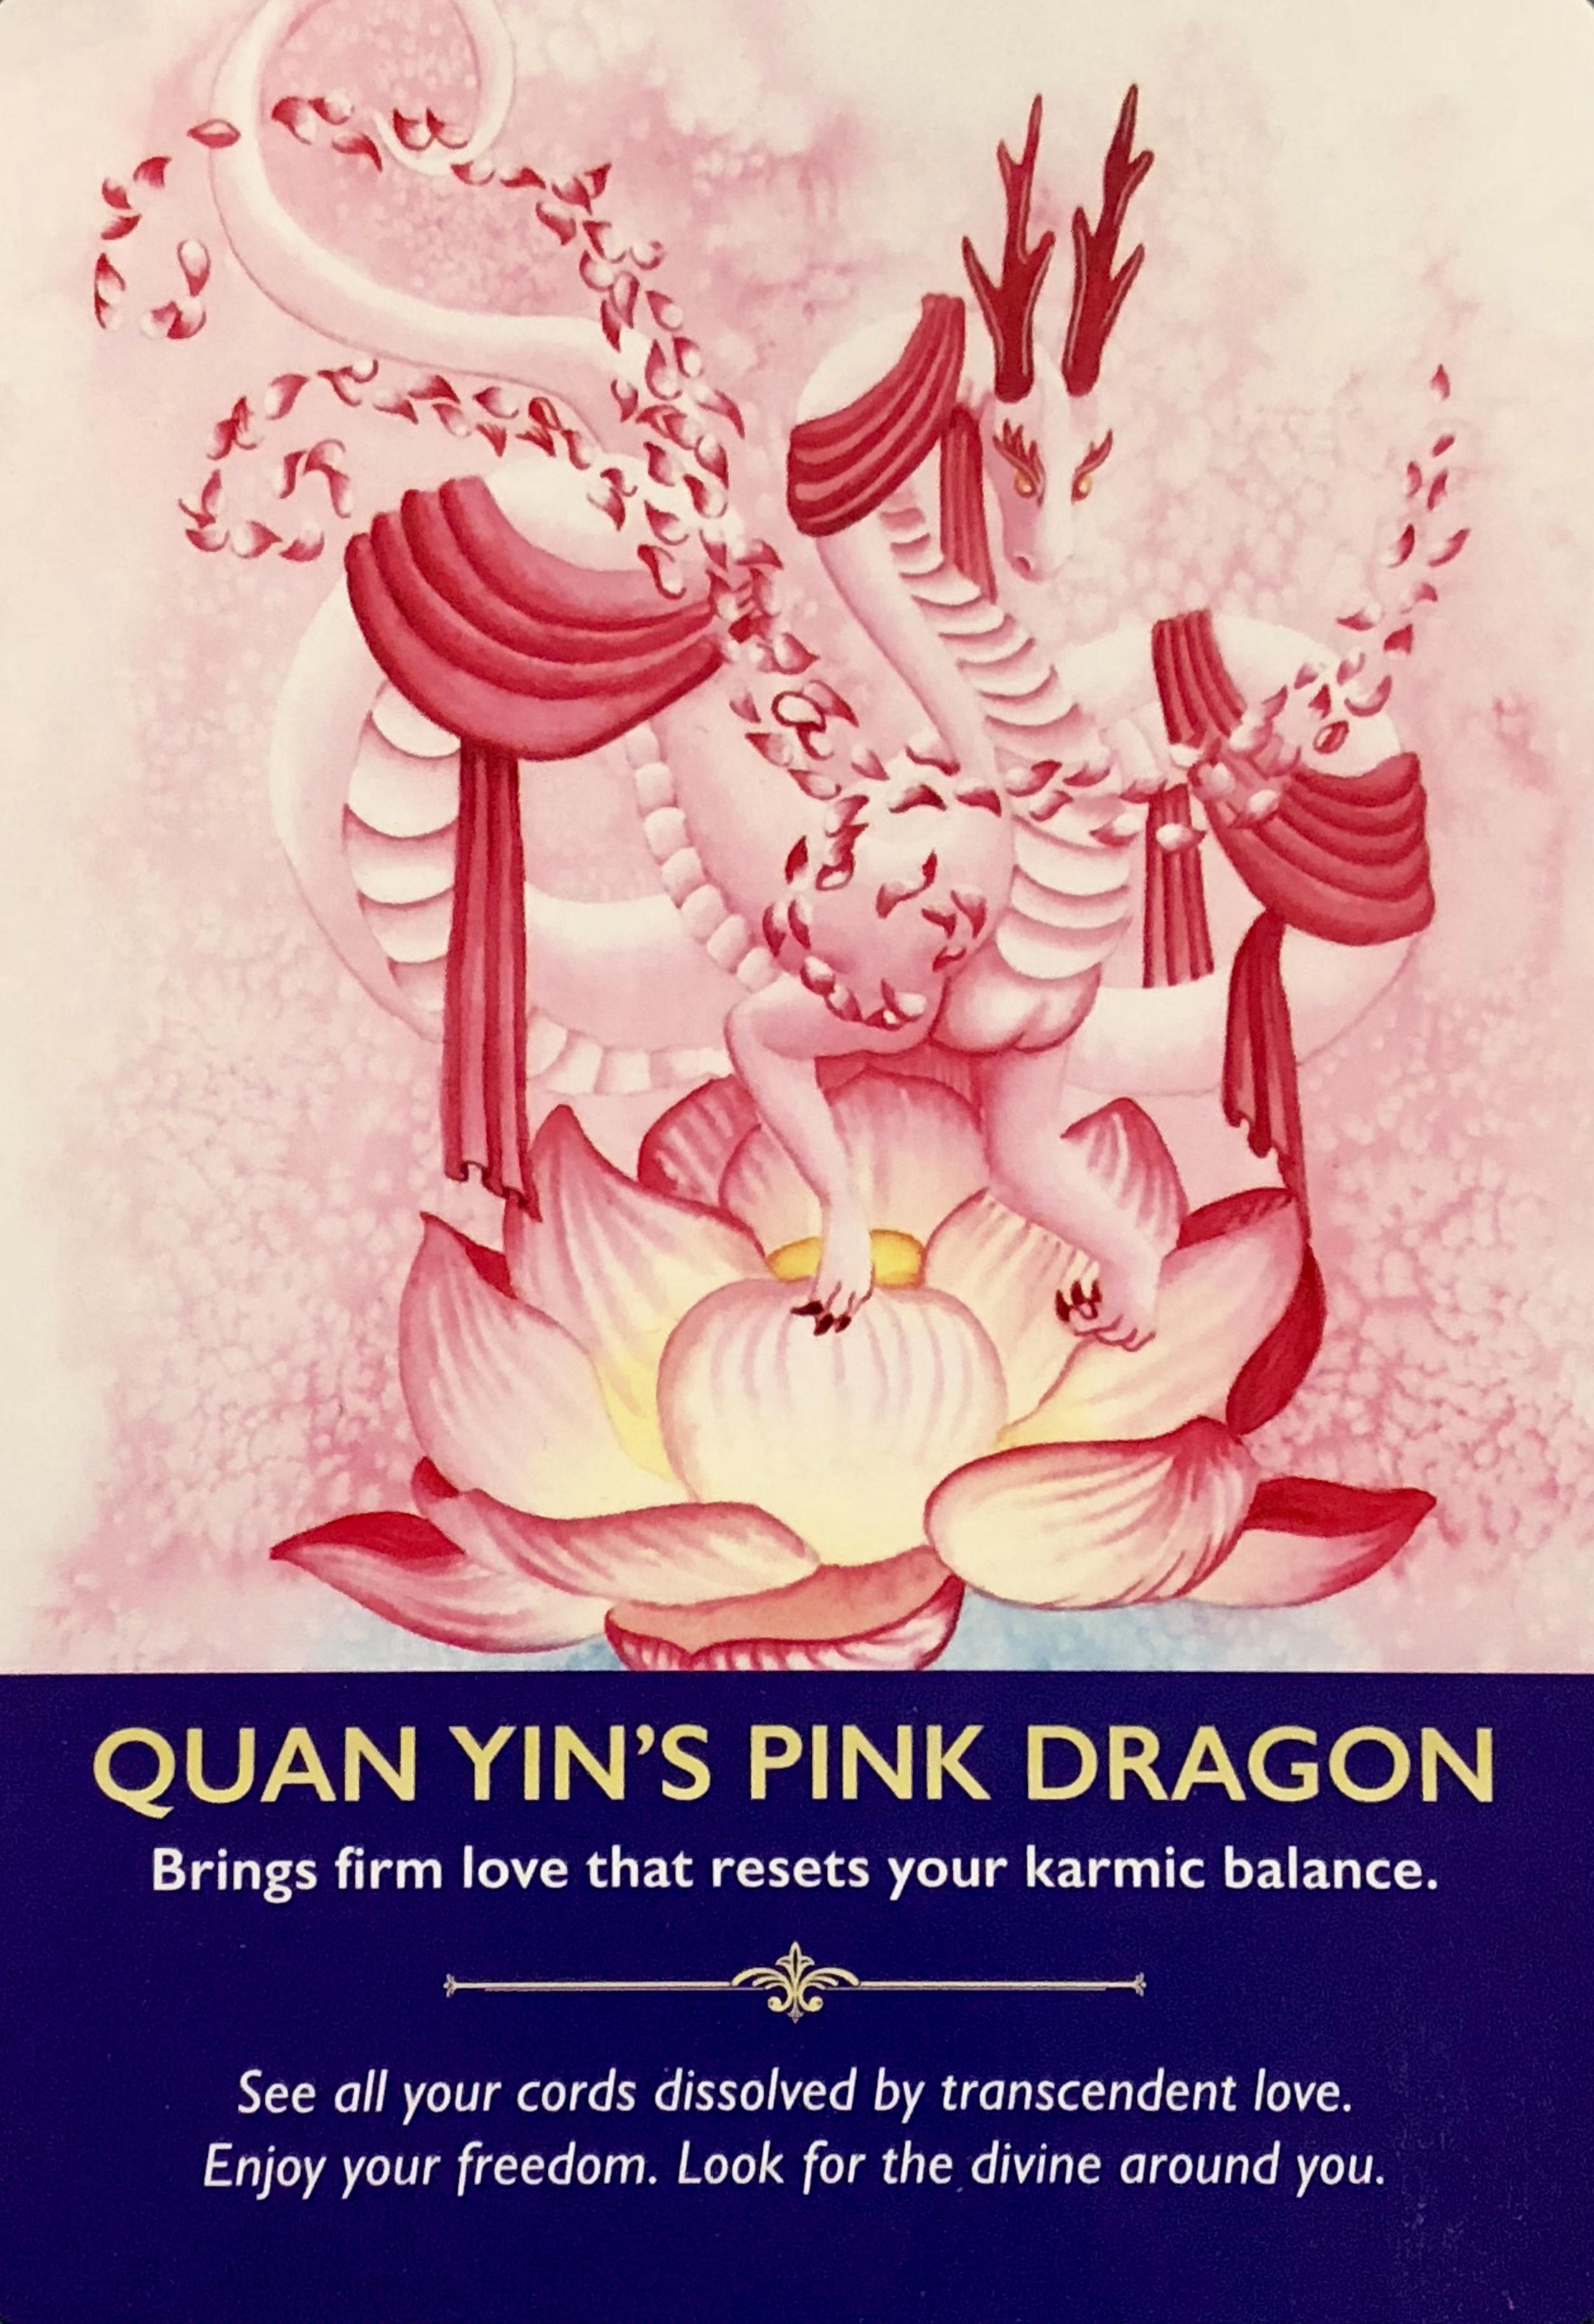 Quan Yin's Pink Dragon – Archangel Oracle